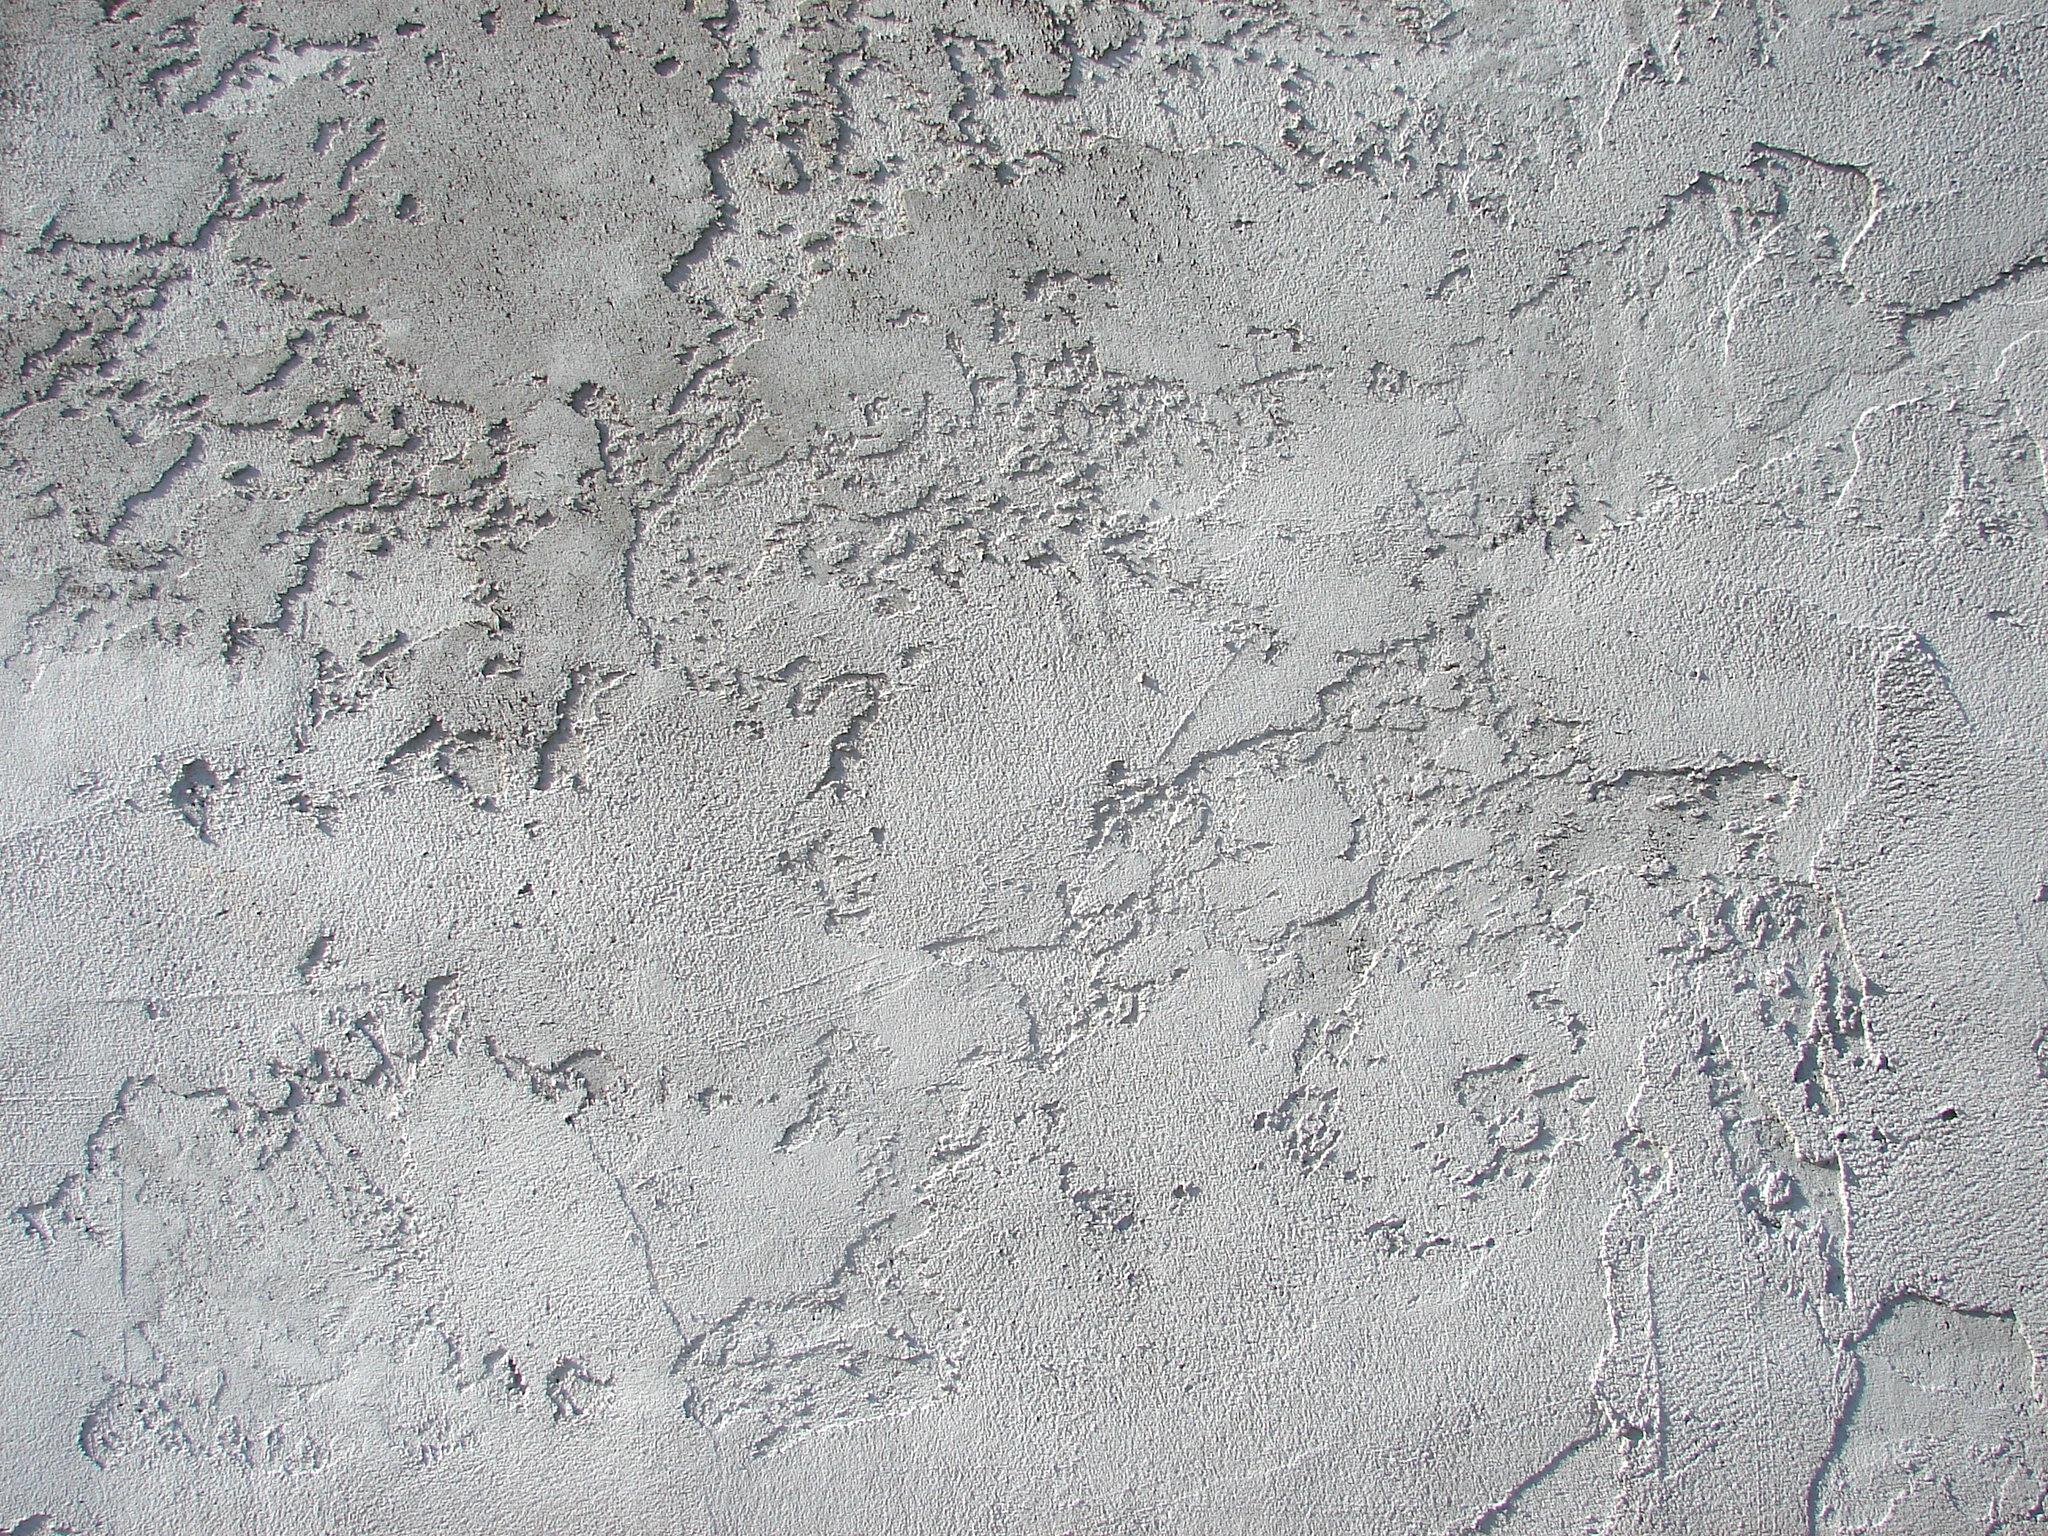 штукатурка под бетон текстура